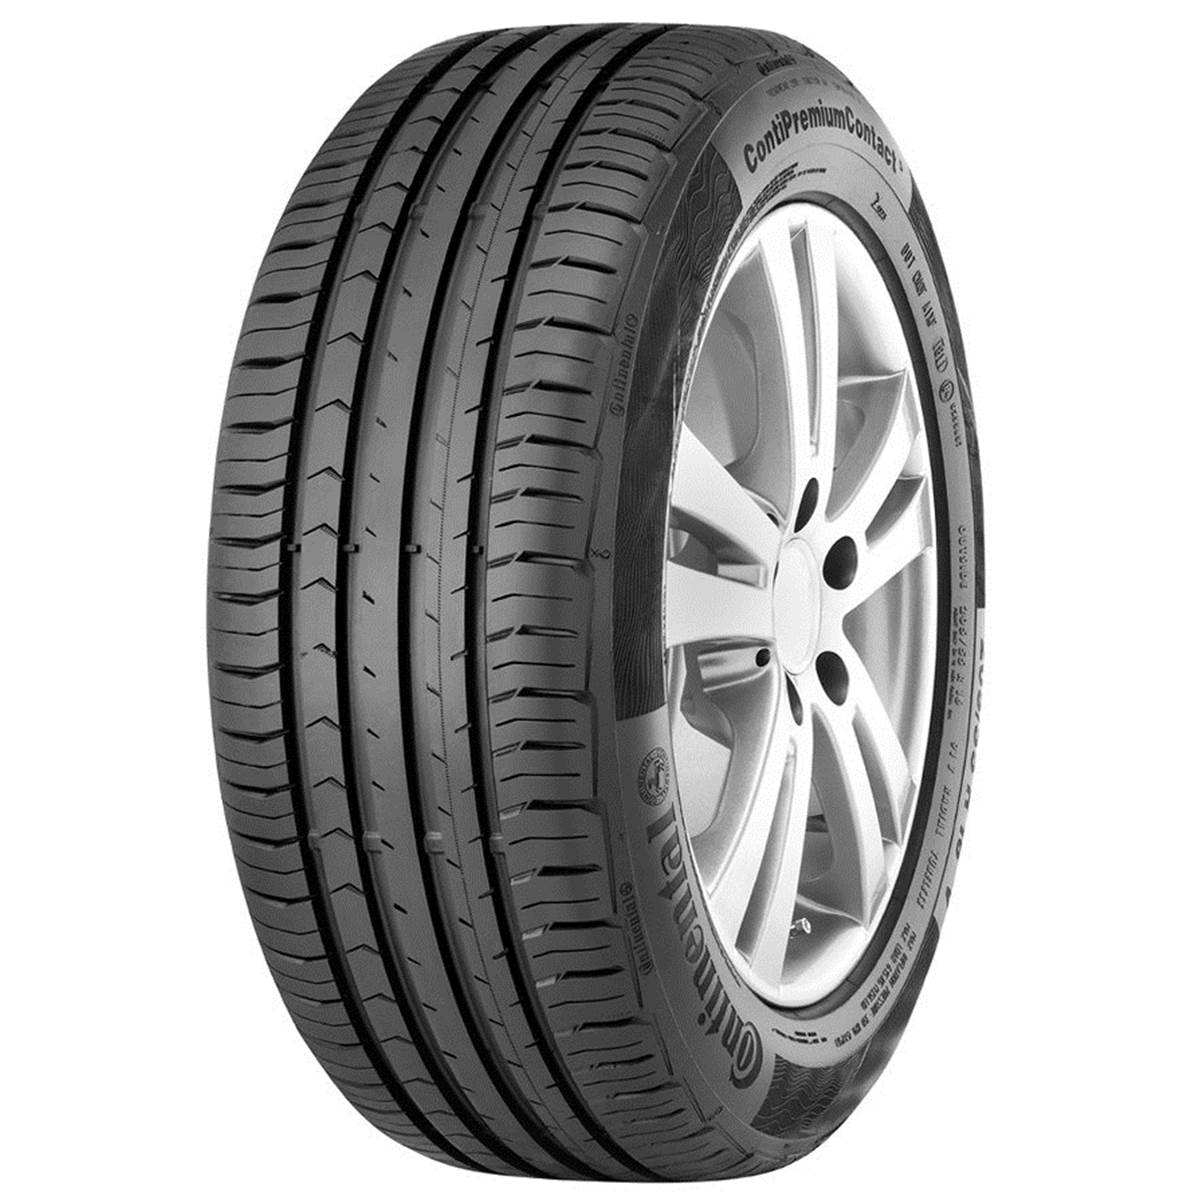 pneu continental 195 55r16 pas cher pneus continental. Black Bedroom Furniture Sets. Home Design Ideas